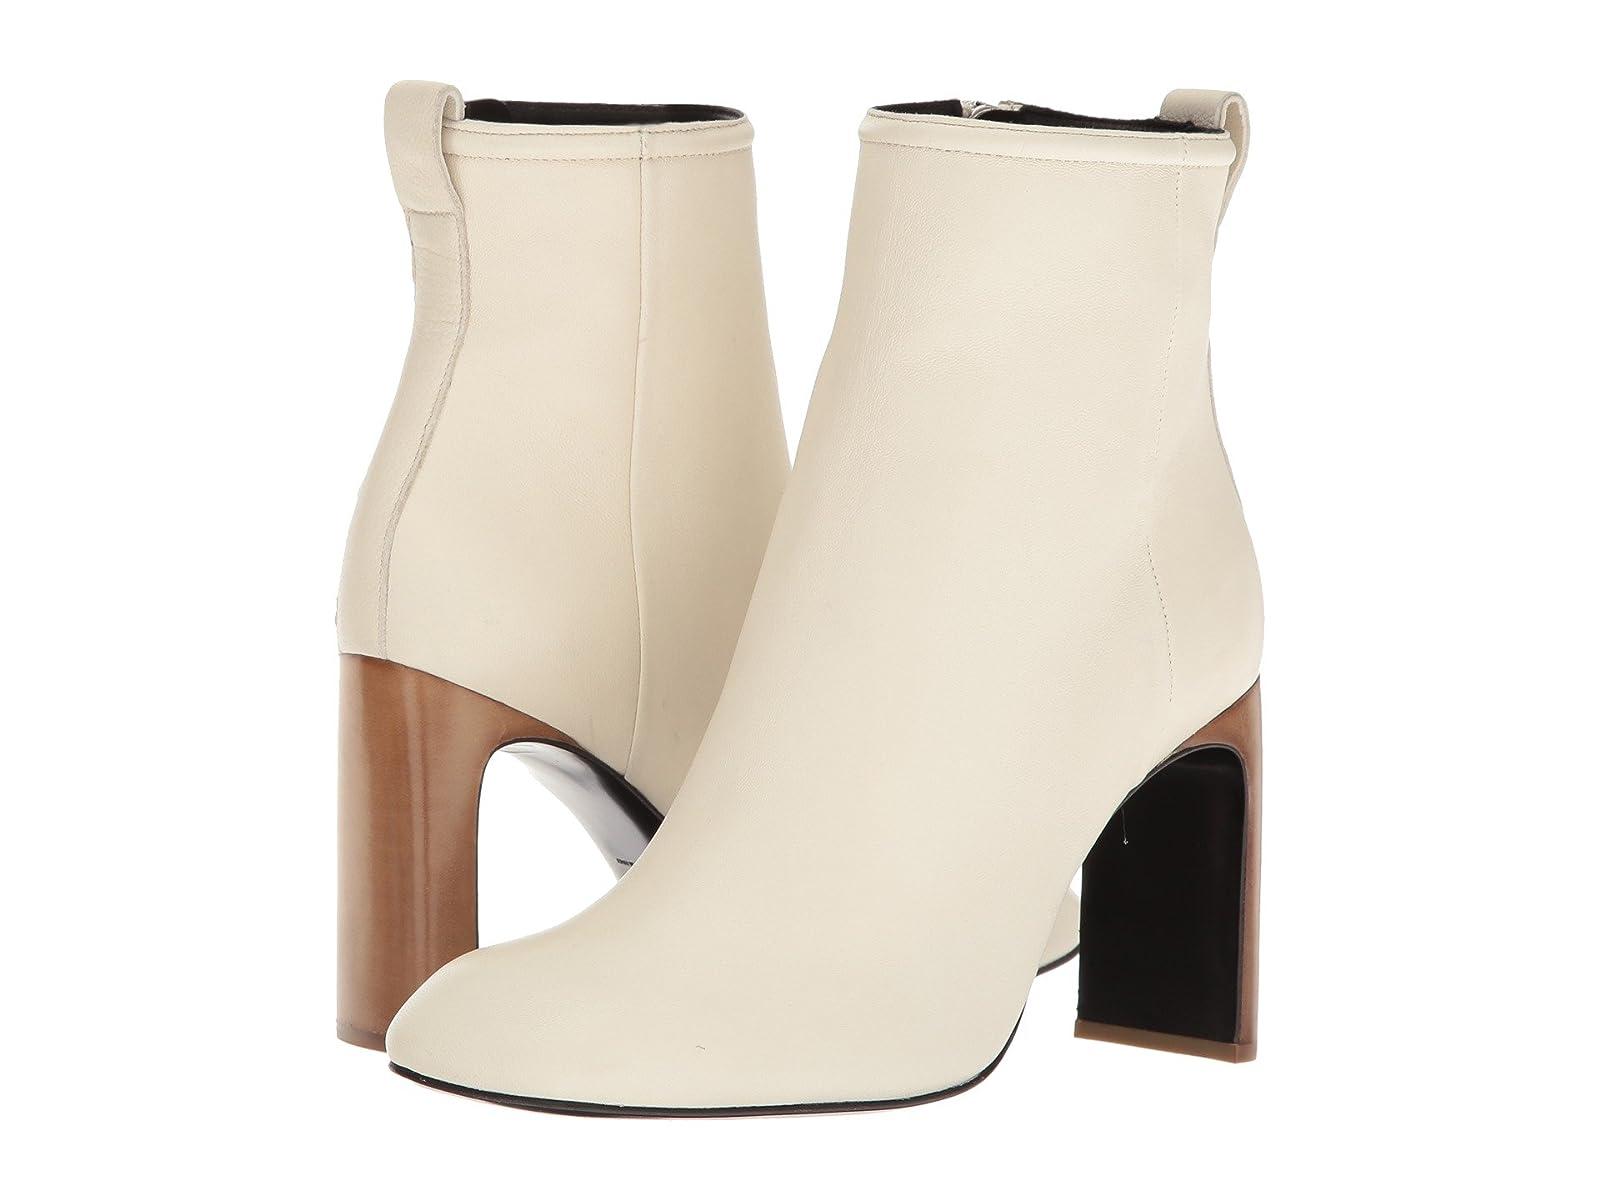 rag & bone EllisEconomical and quality shoes